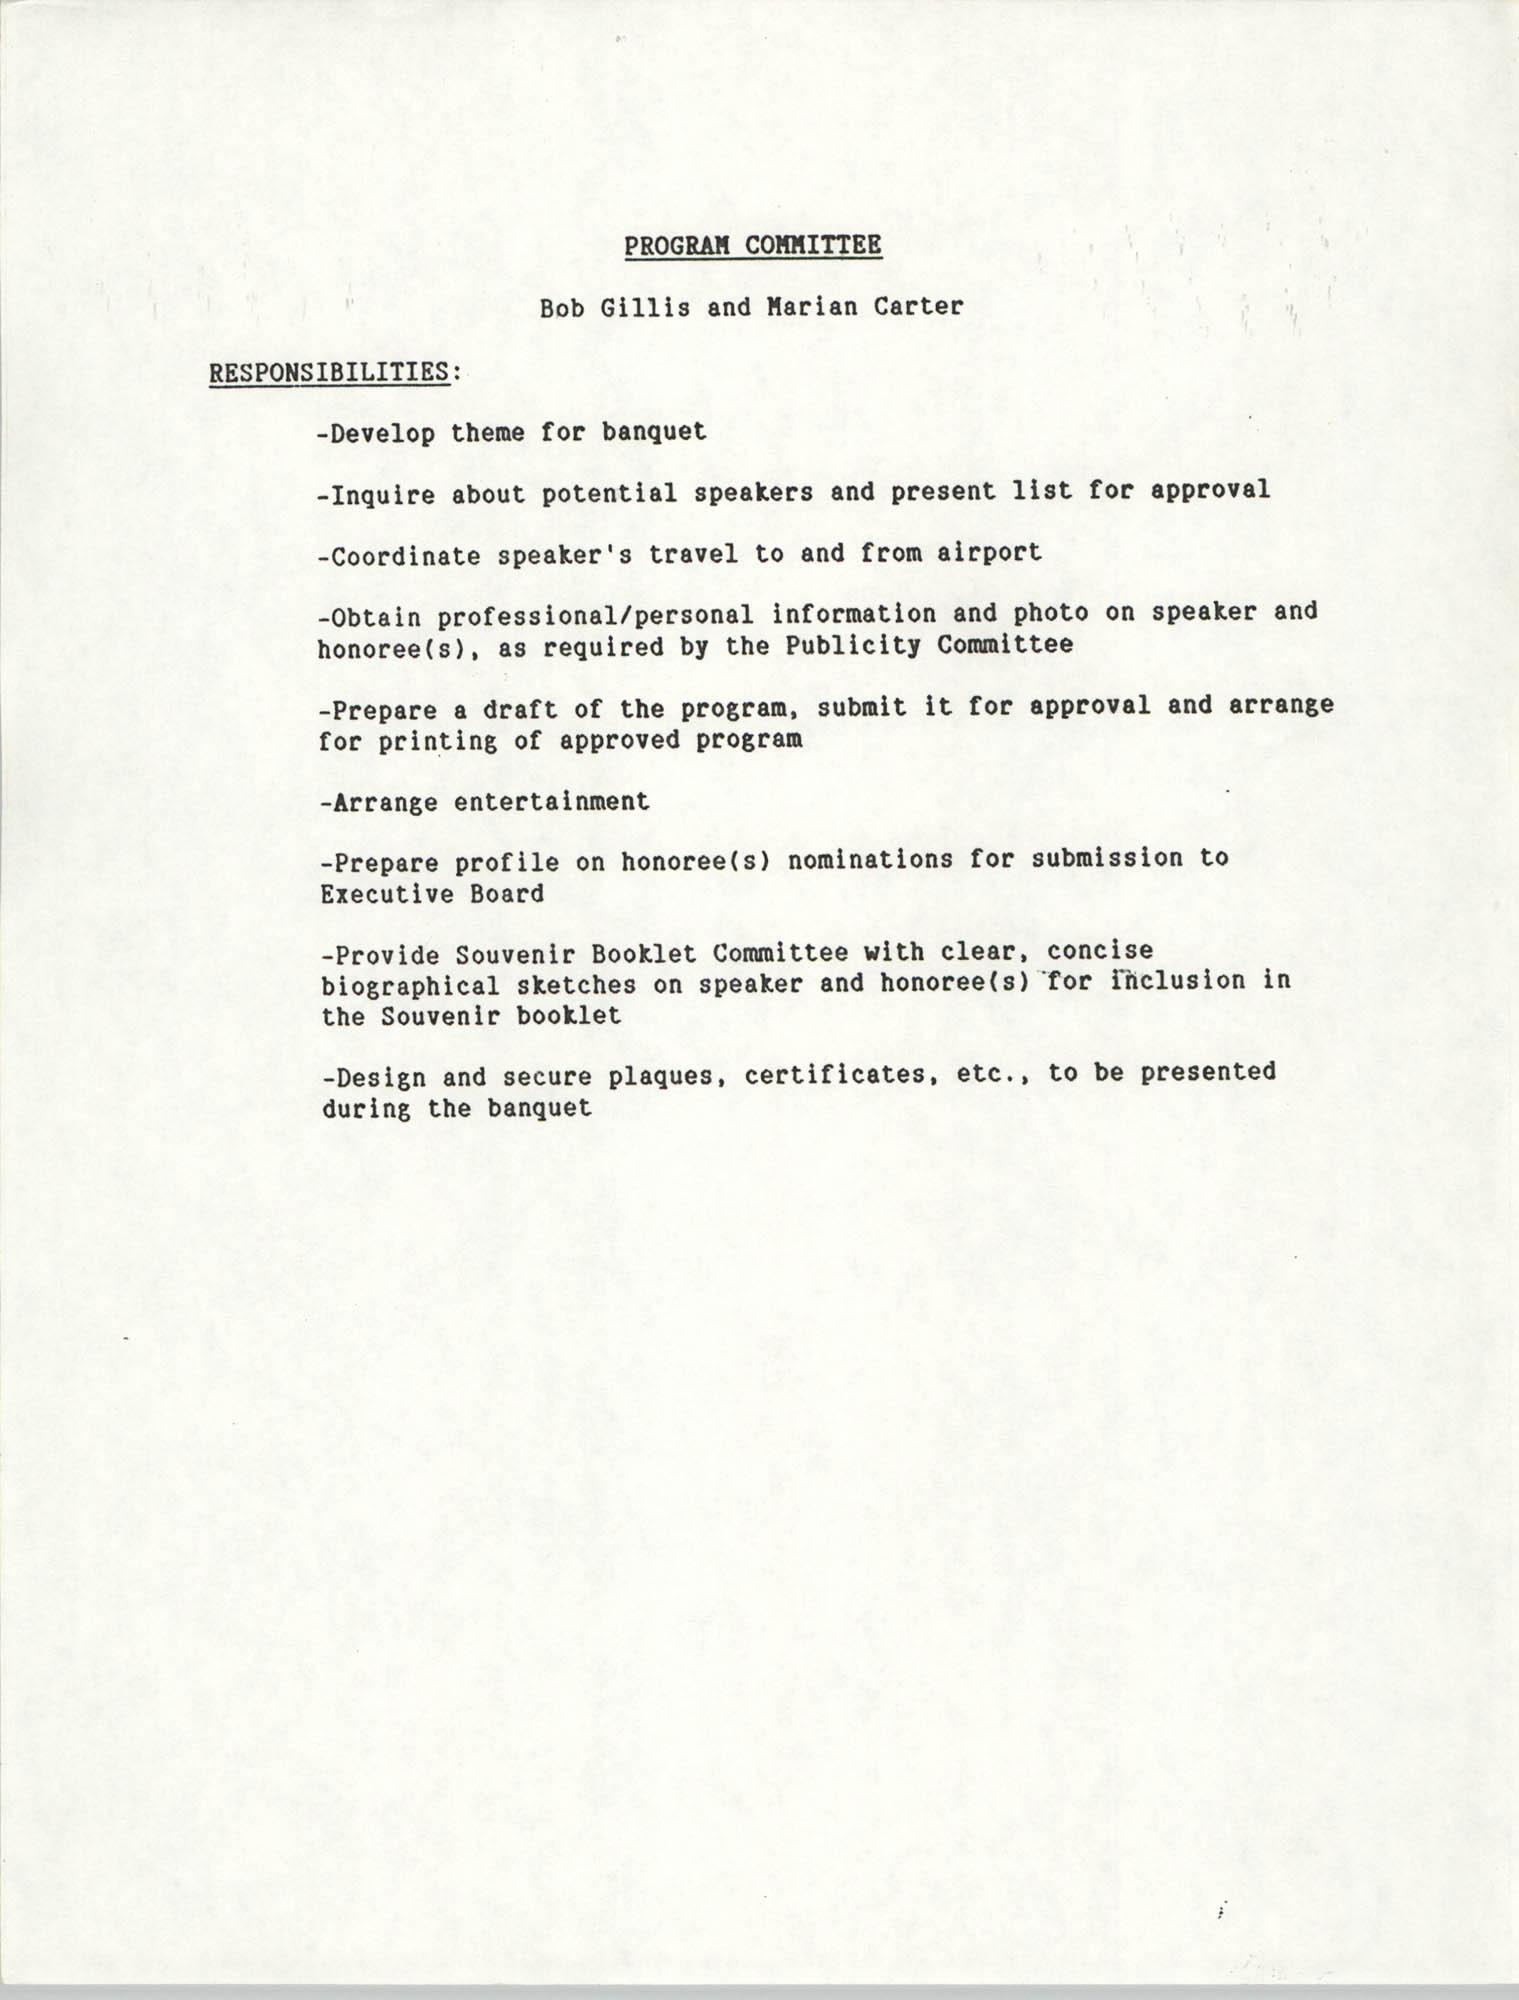 List of responsibilities, Program Committee, Bob Gillis and Marian Carter